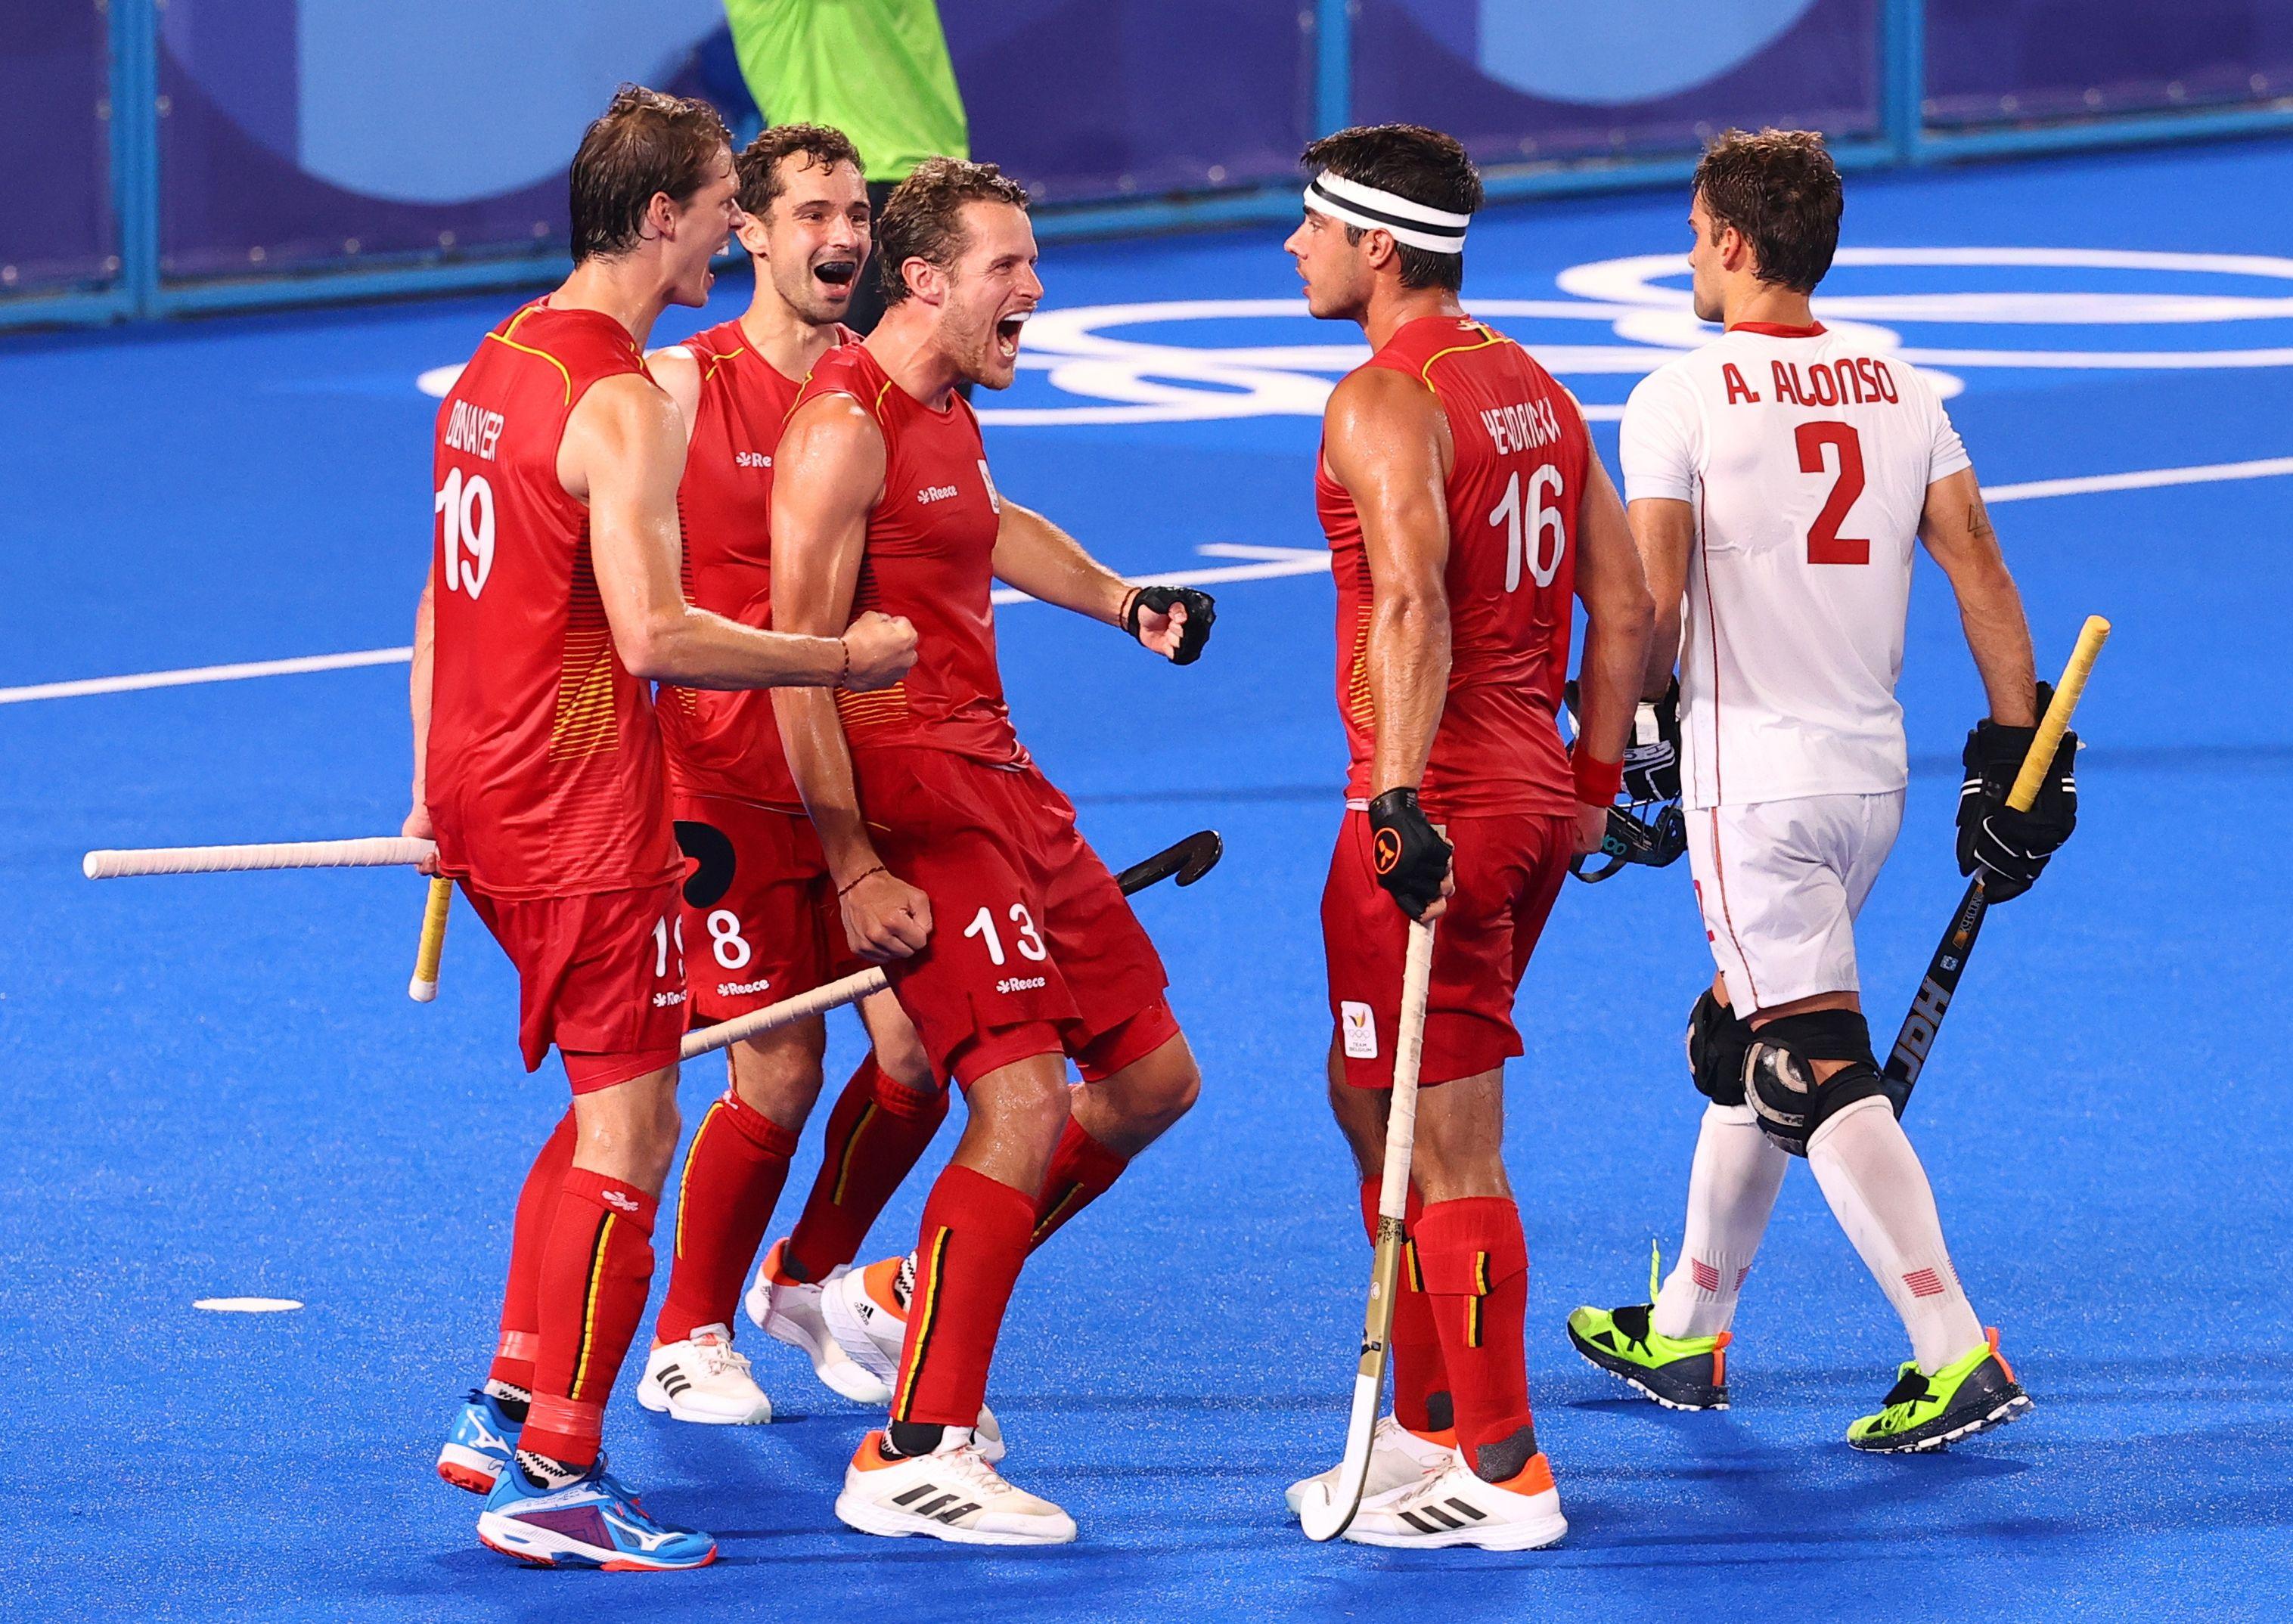 Tokyo 2020 Olympics - Hockey - Men - Quarterfinal - Belgium v Spain - Oi Hockey Stadium, Tokyo, Japan - August 1, 2021. Alex Hendrickx of Belgium celebrates with teammates after scoring. REUTERS/Bernadett Szabo